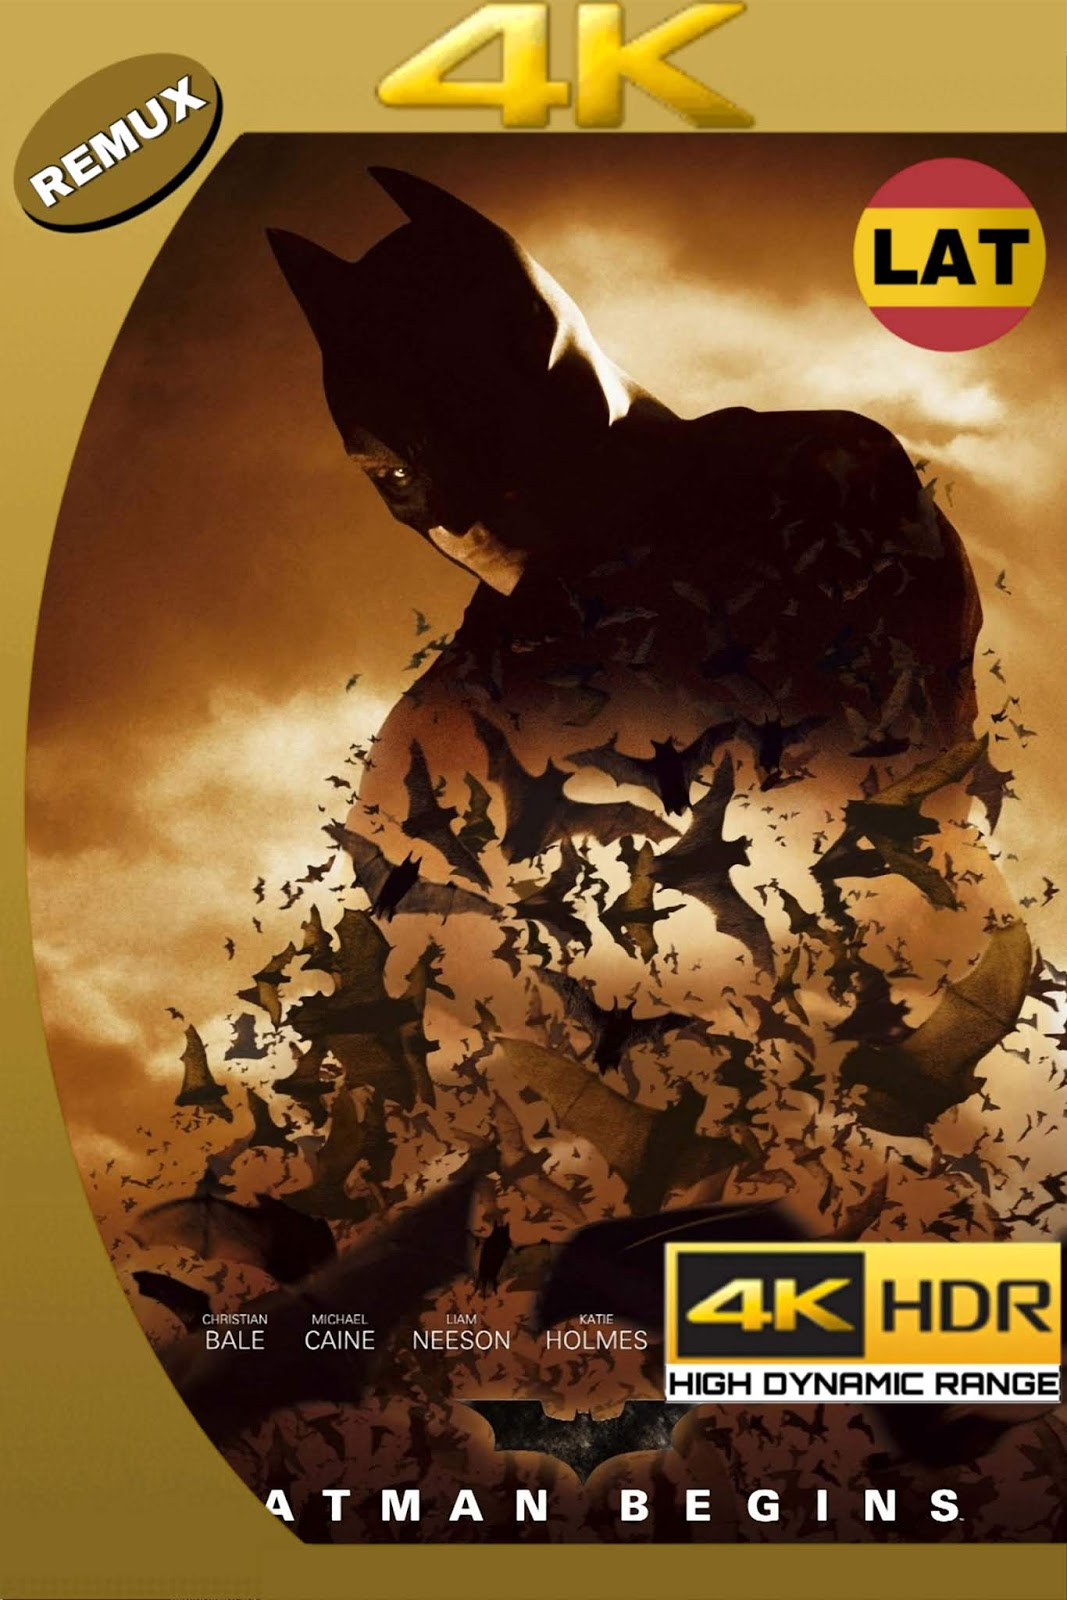 BATMAN INICIA 2005 LATINO+2 UHD 4K HDR 2160P 56GB.mkv